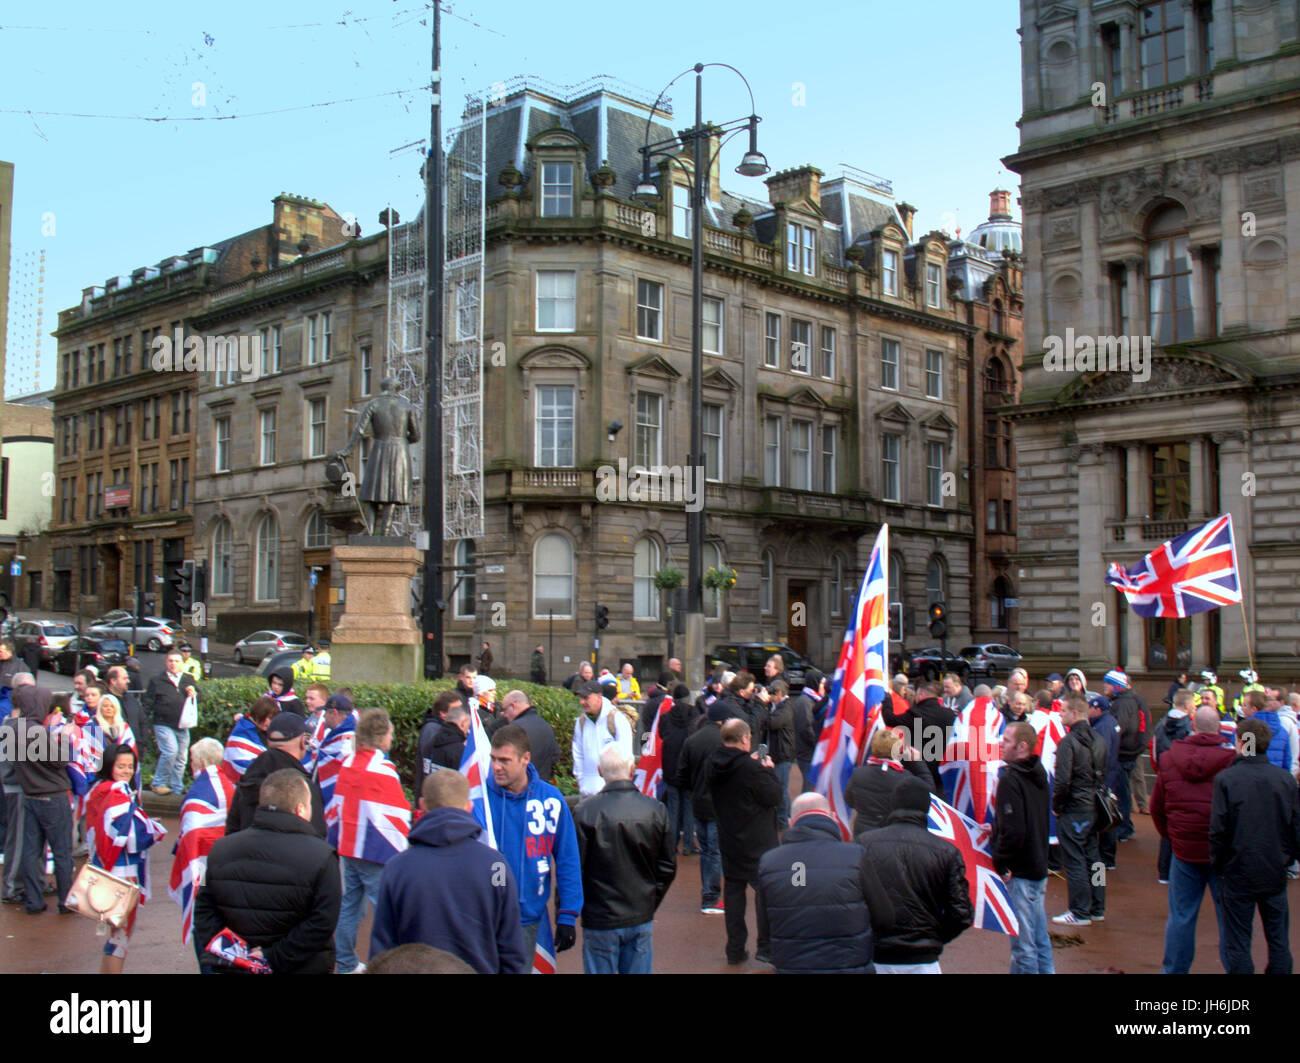 protestant loyalist unionist Rangers football club rally George Square Glasgow Scotland union jack flags - Stock Image